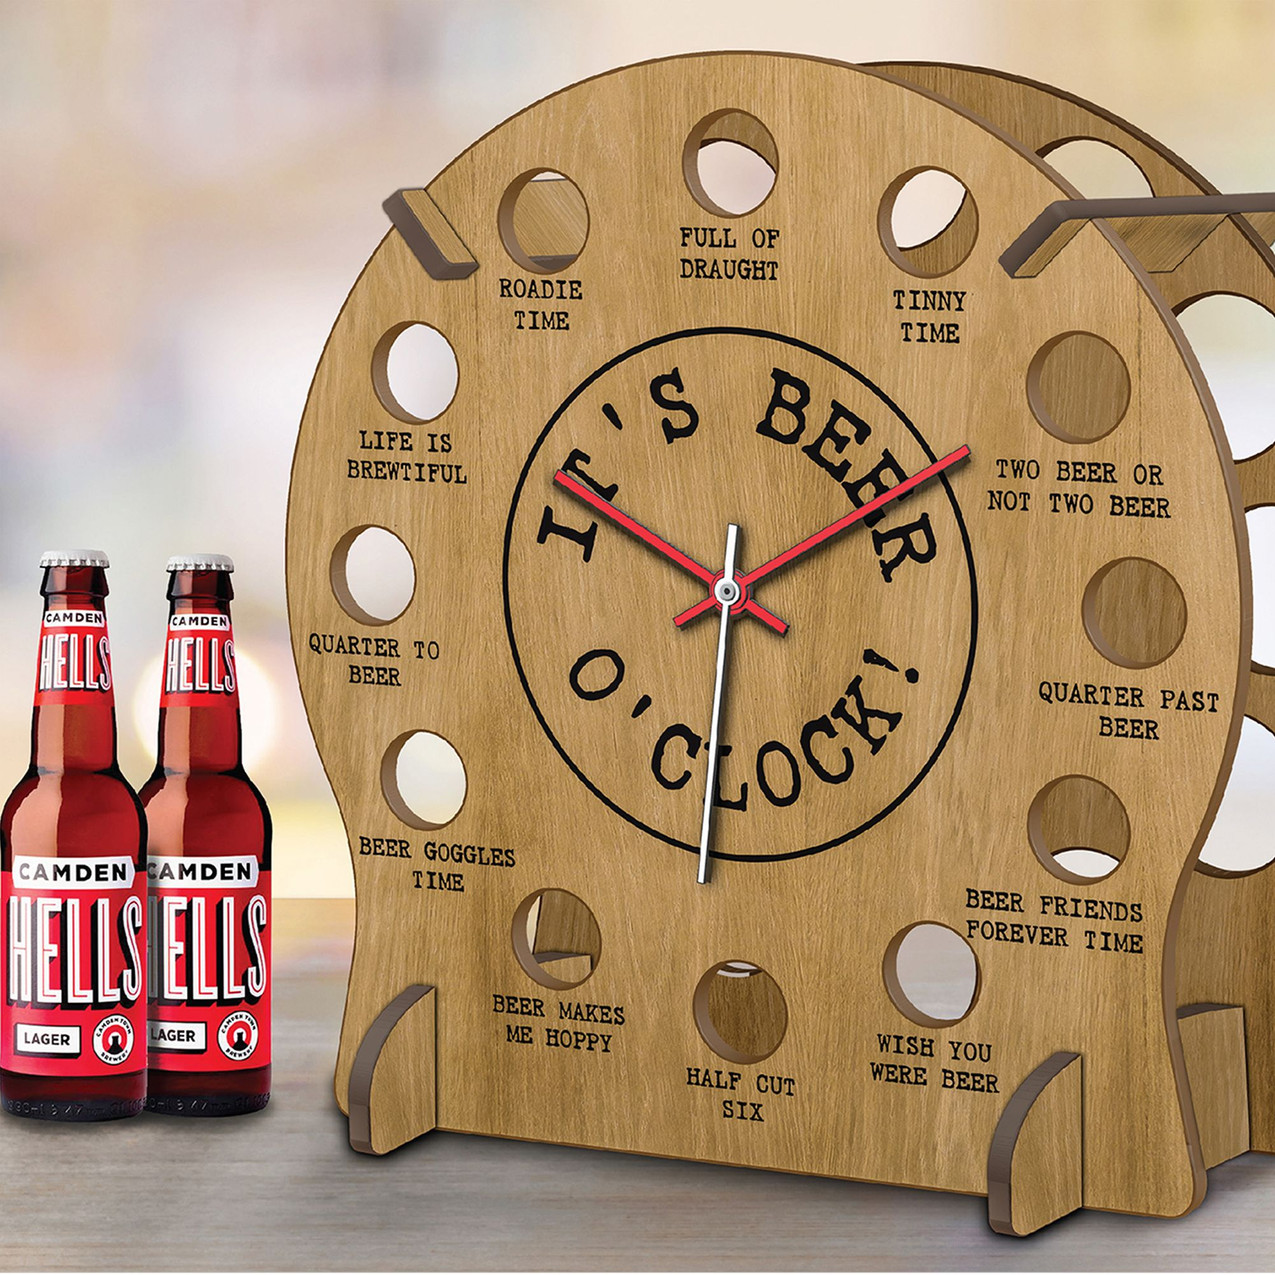 Beer oclock advent calendar